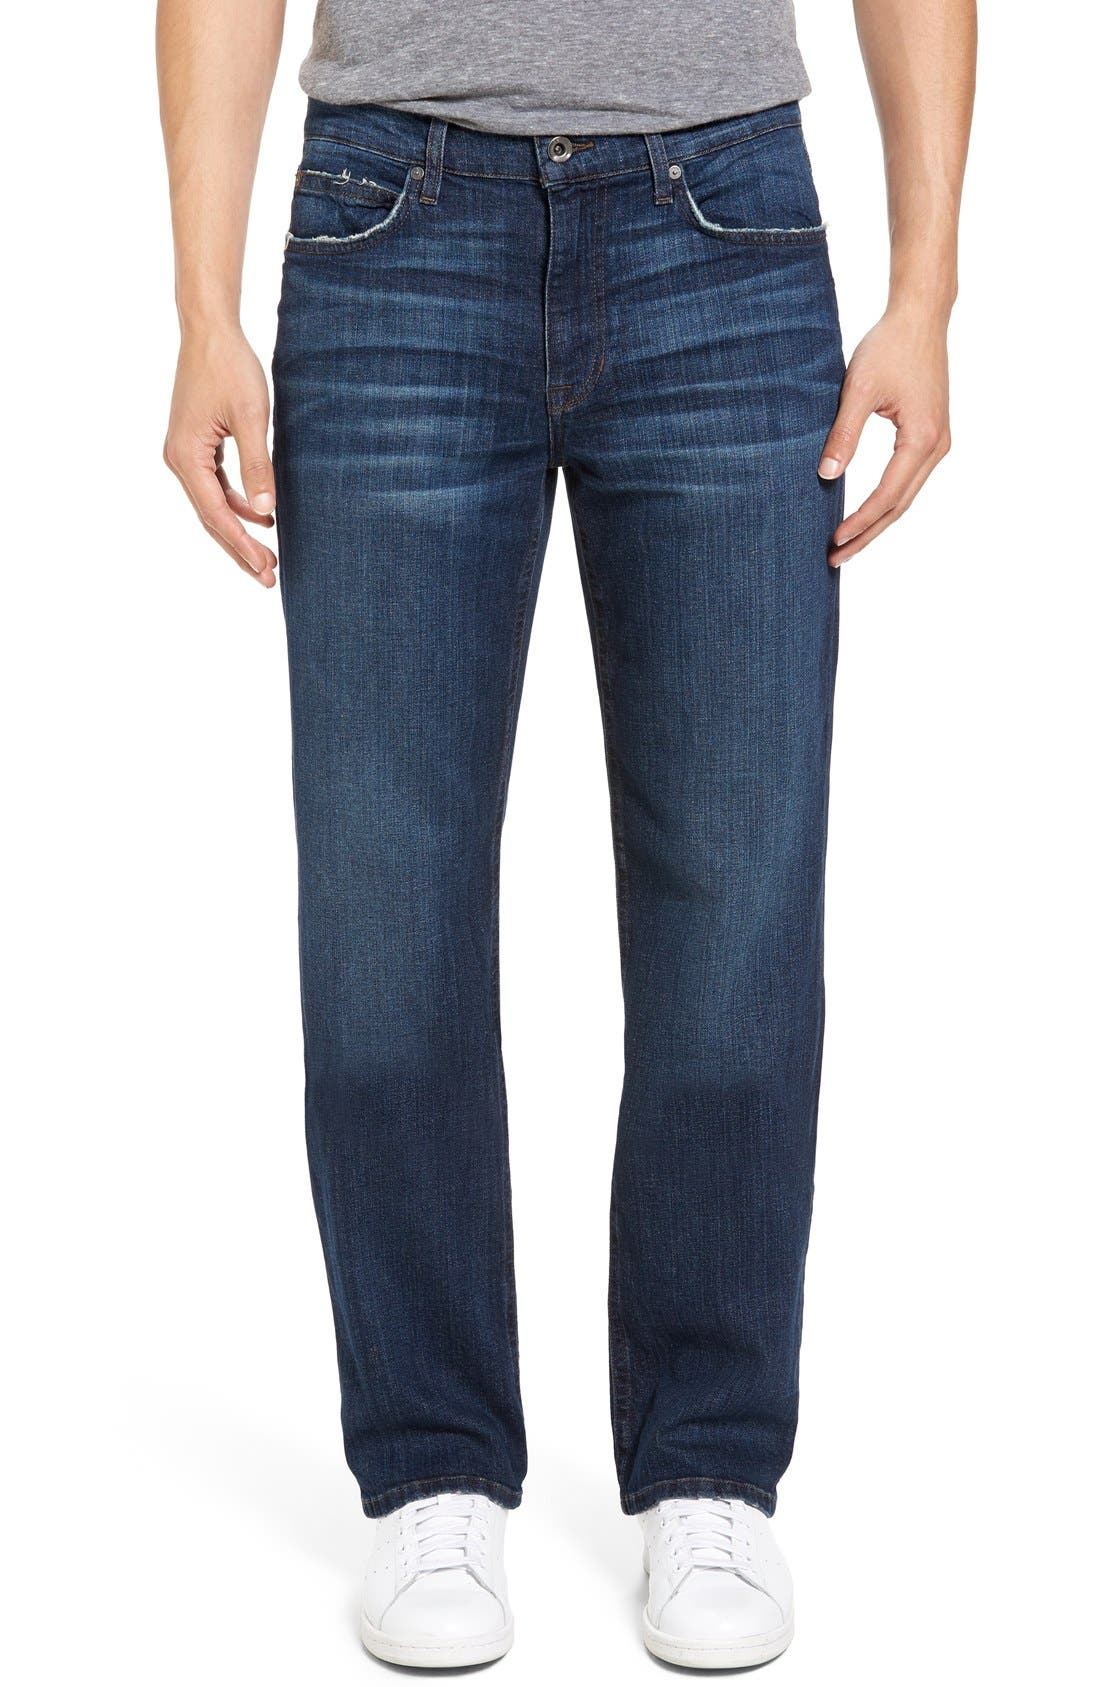 Main Image - Joe's Rebel Relaxed Fit Jeans (Kane)